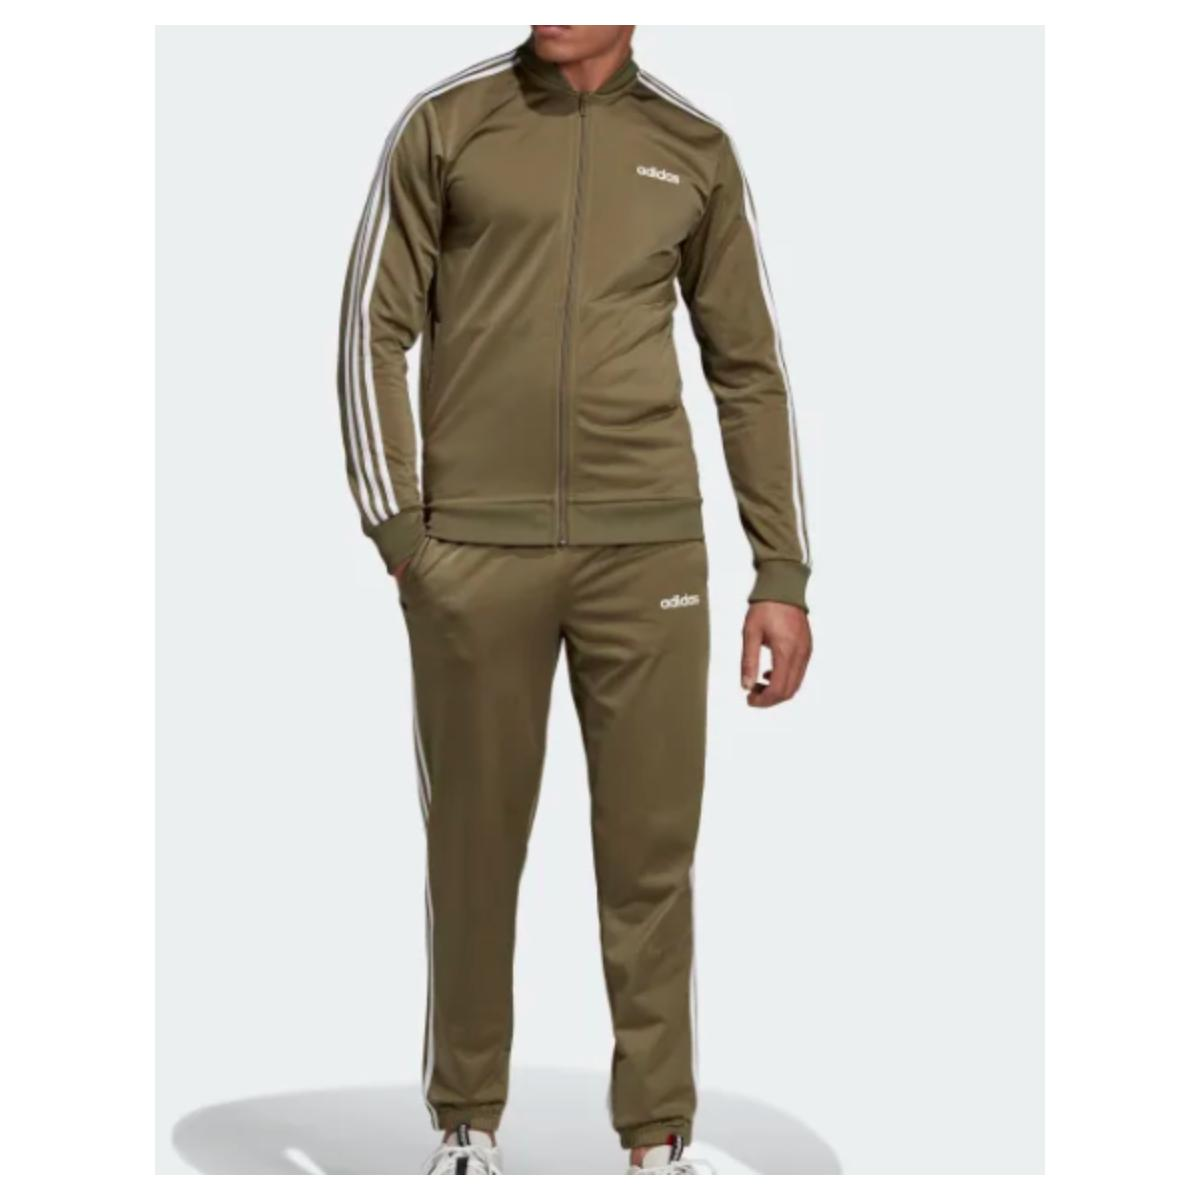 Abrigo Masculino Adidas Dv2469 Mts B2bas 3s Verde/branco